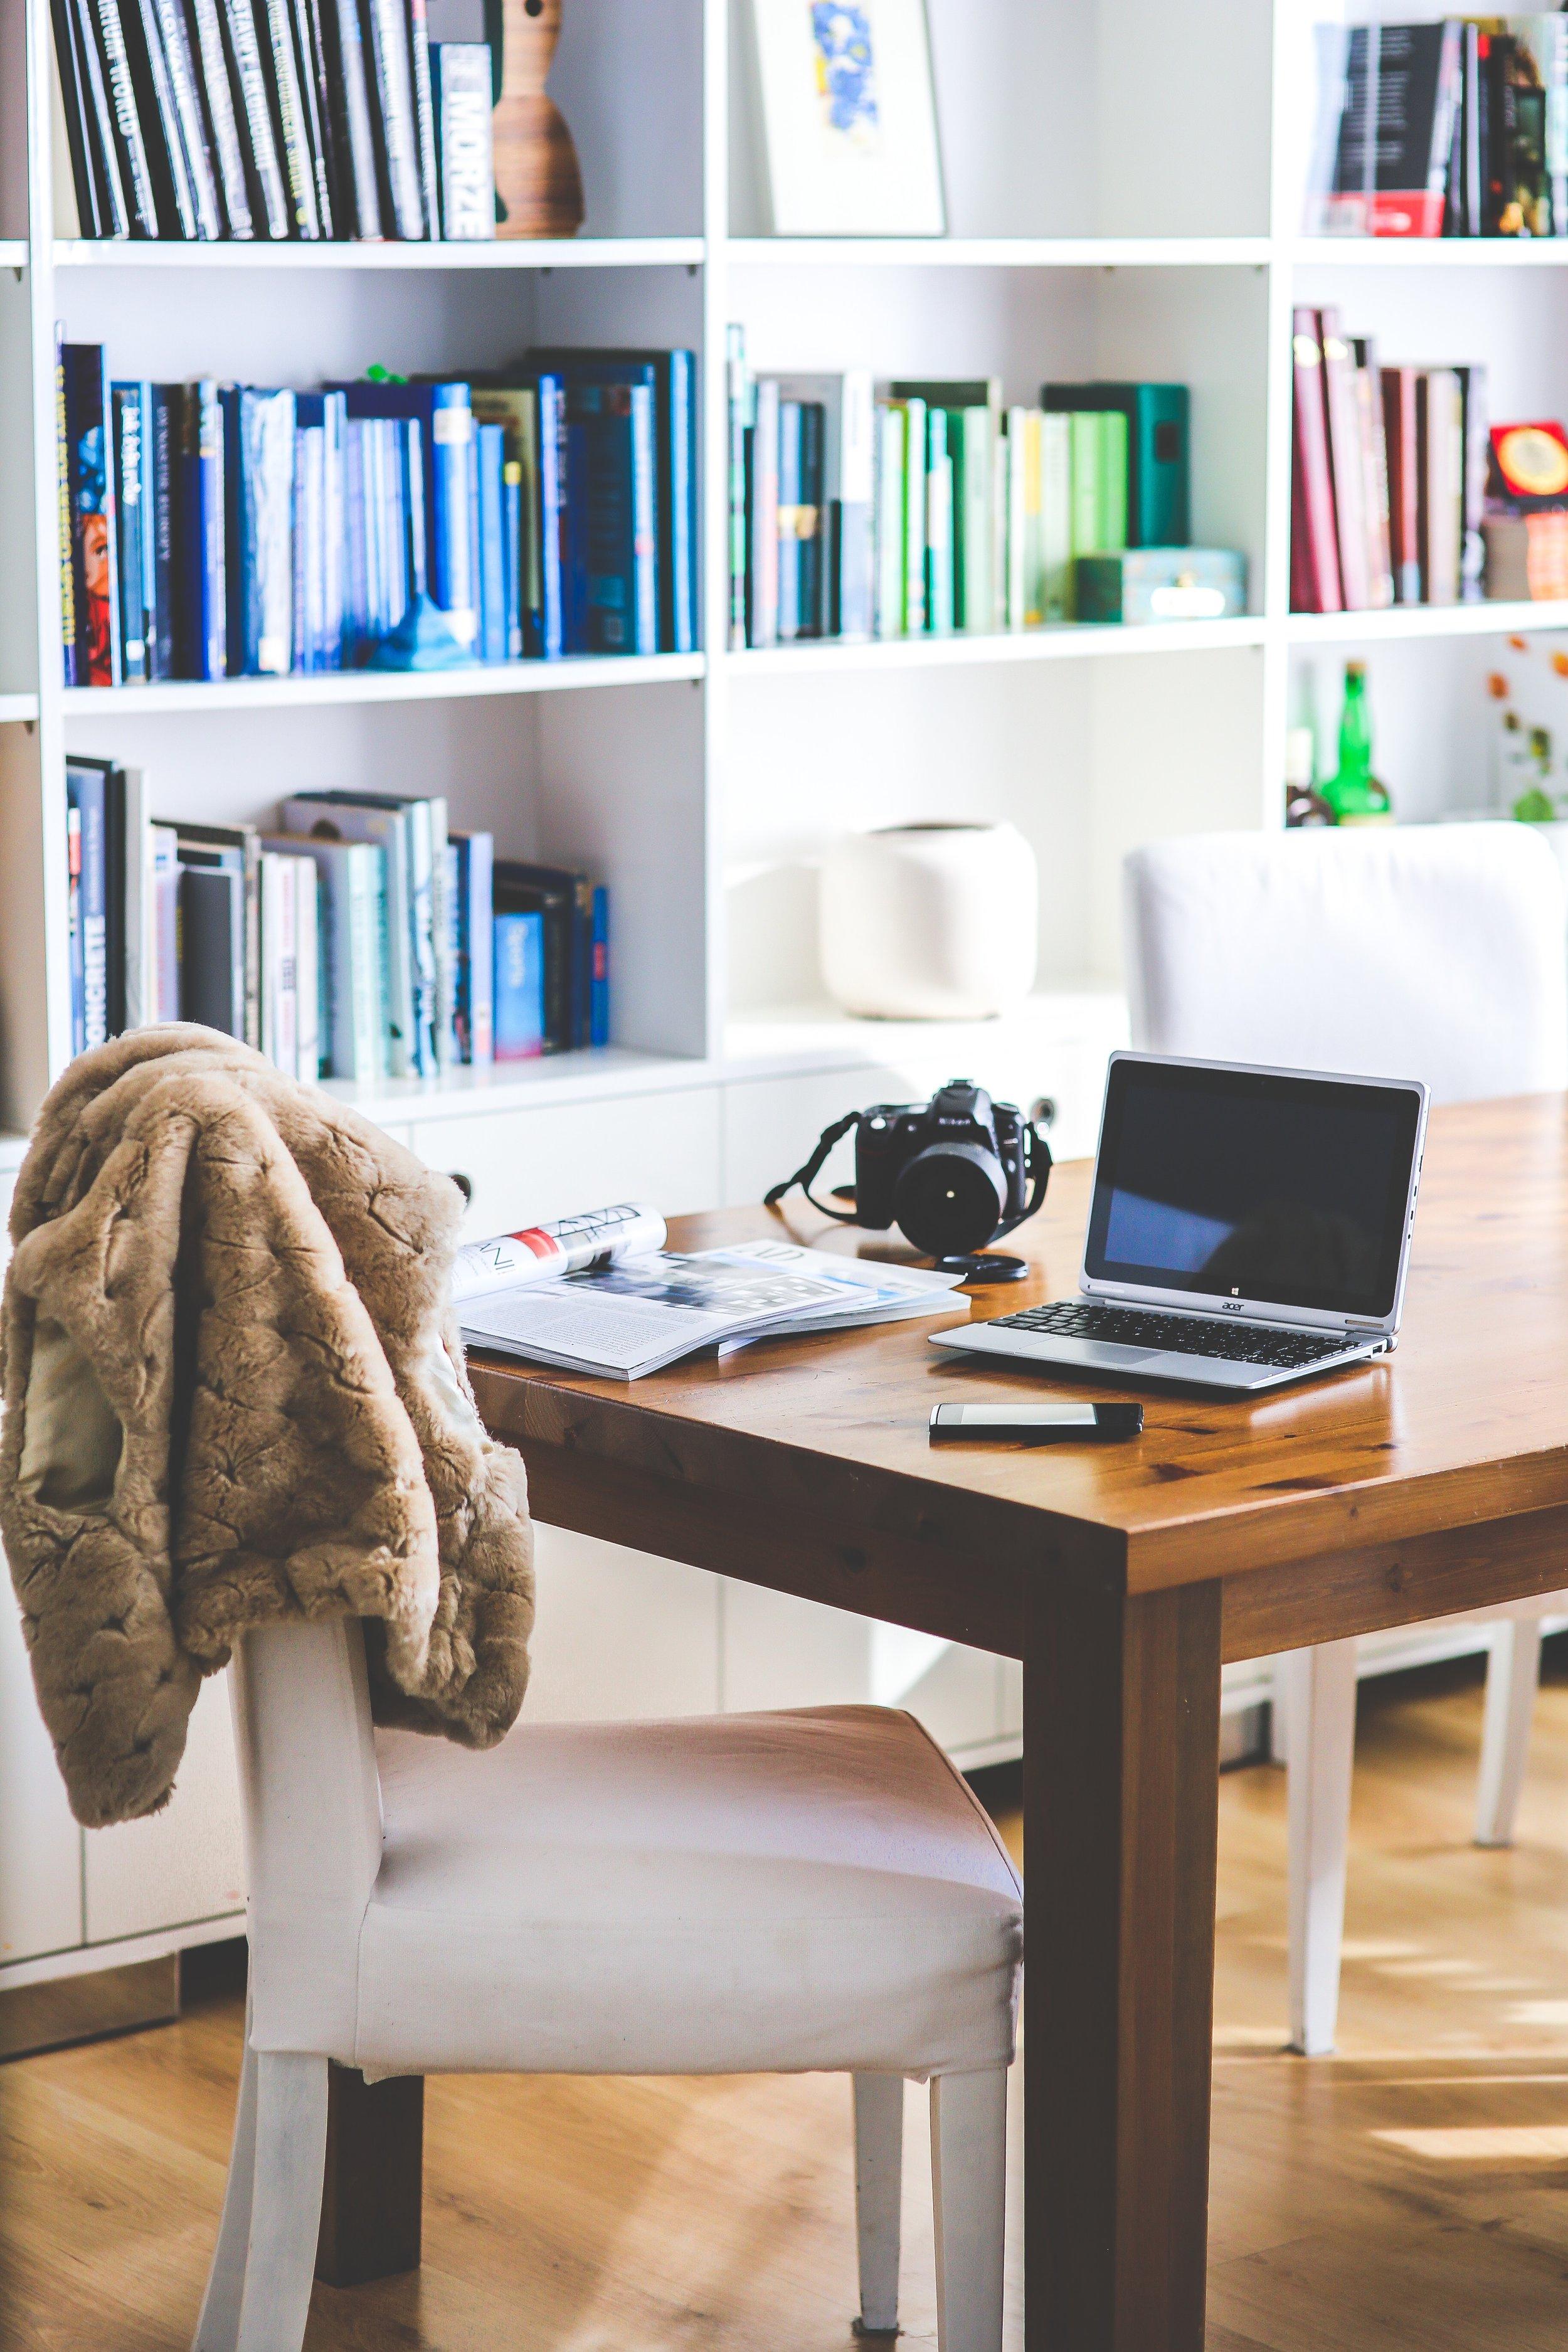 apartment-bookcase-camera-6259.jpg